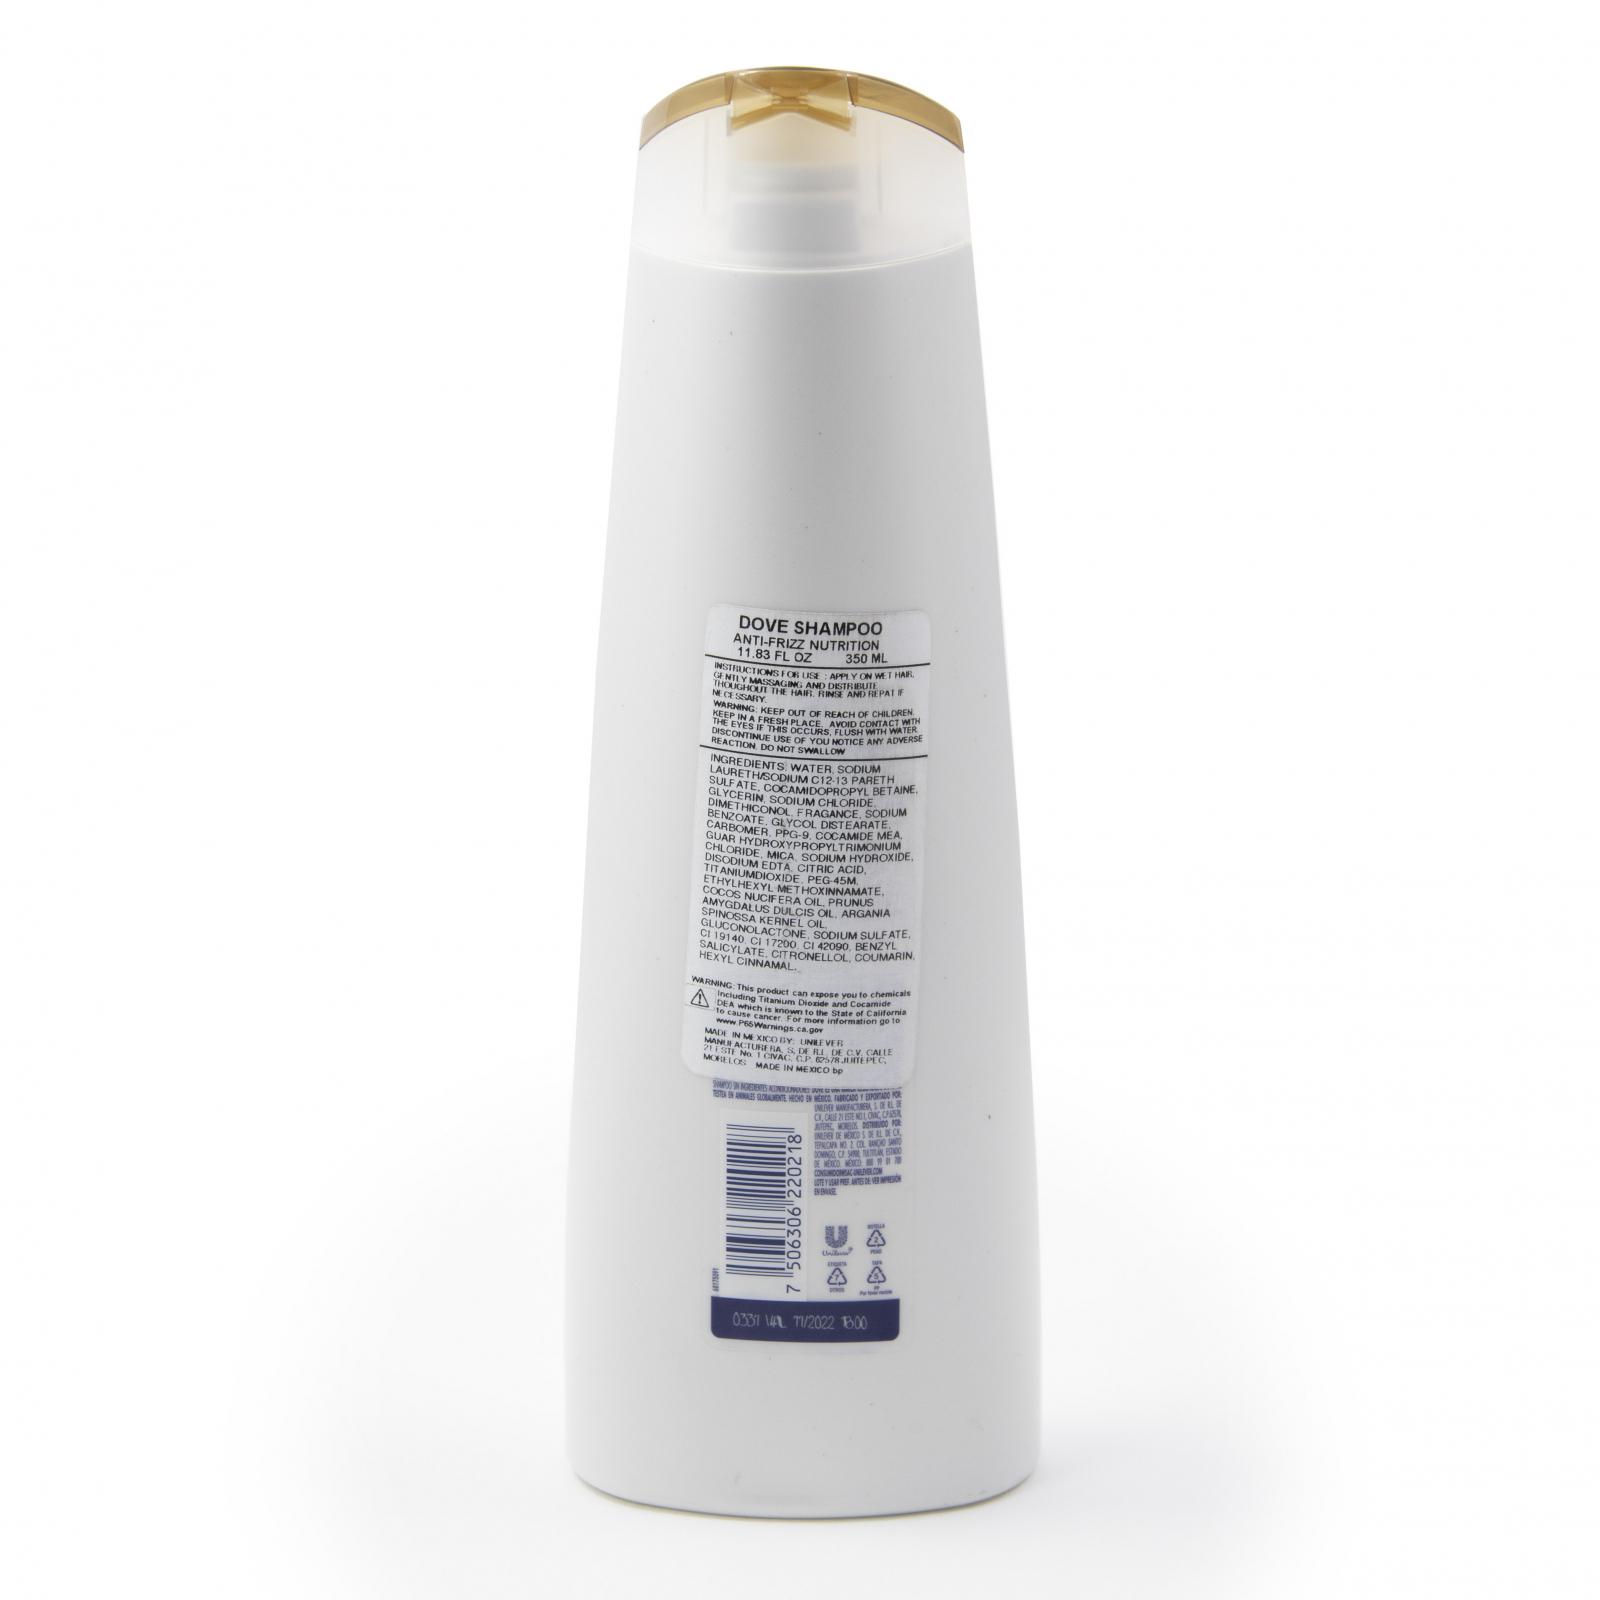 Dove Hair Care Shampoo Anti Frizz Formula with Argan Oil